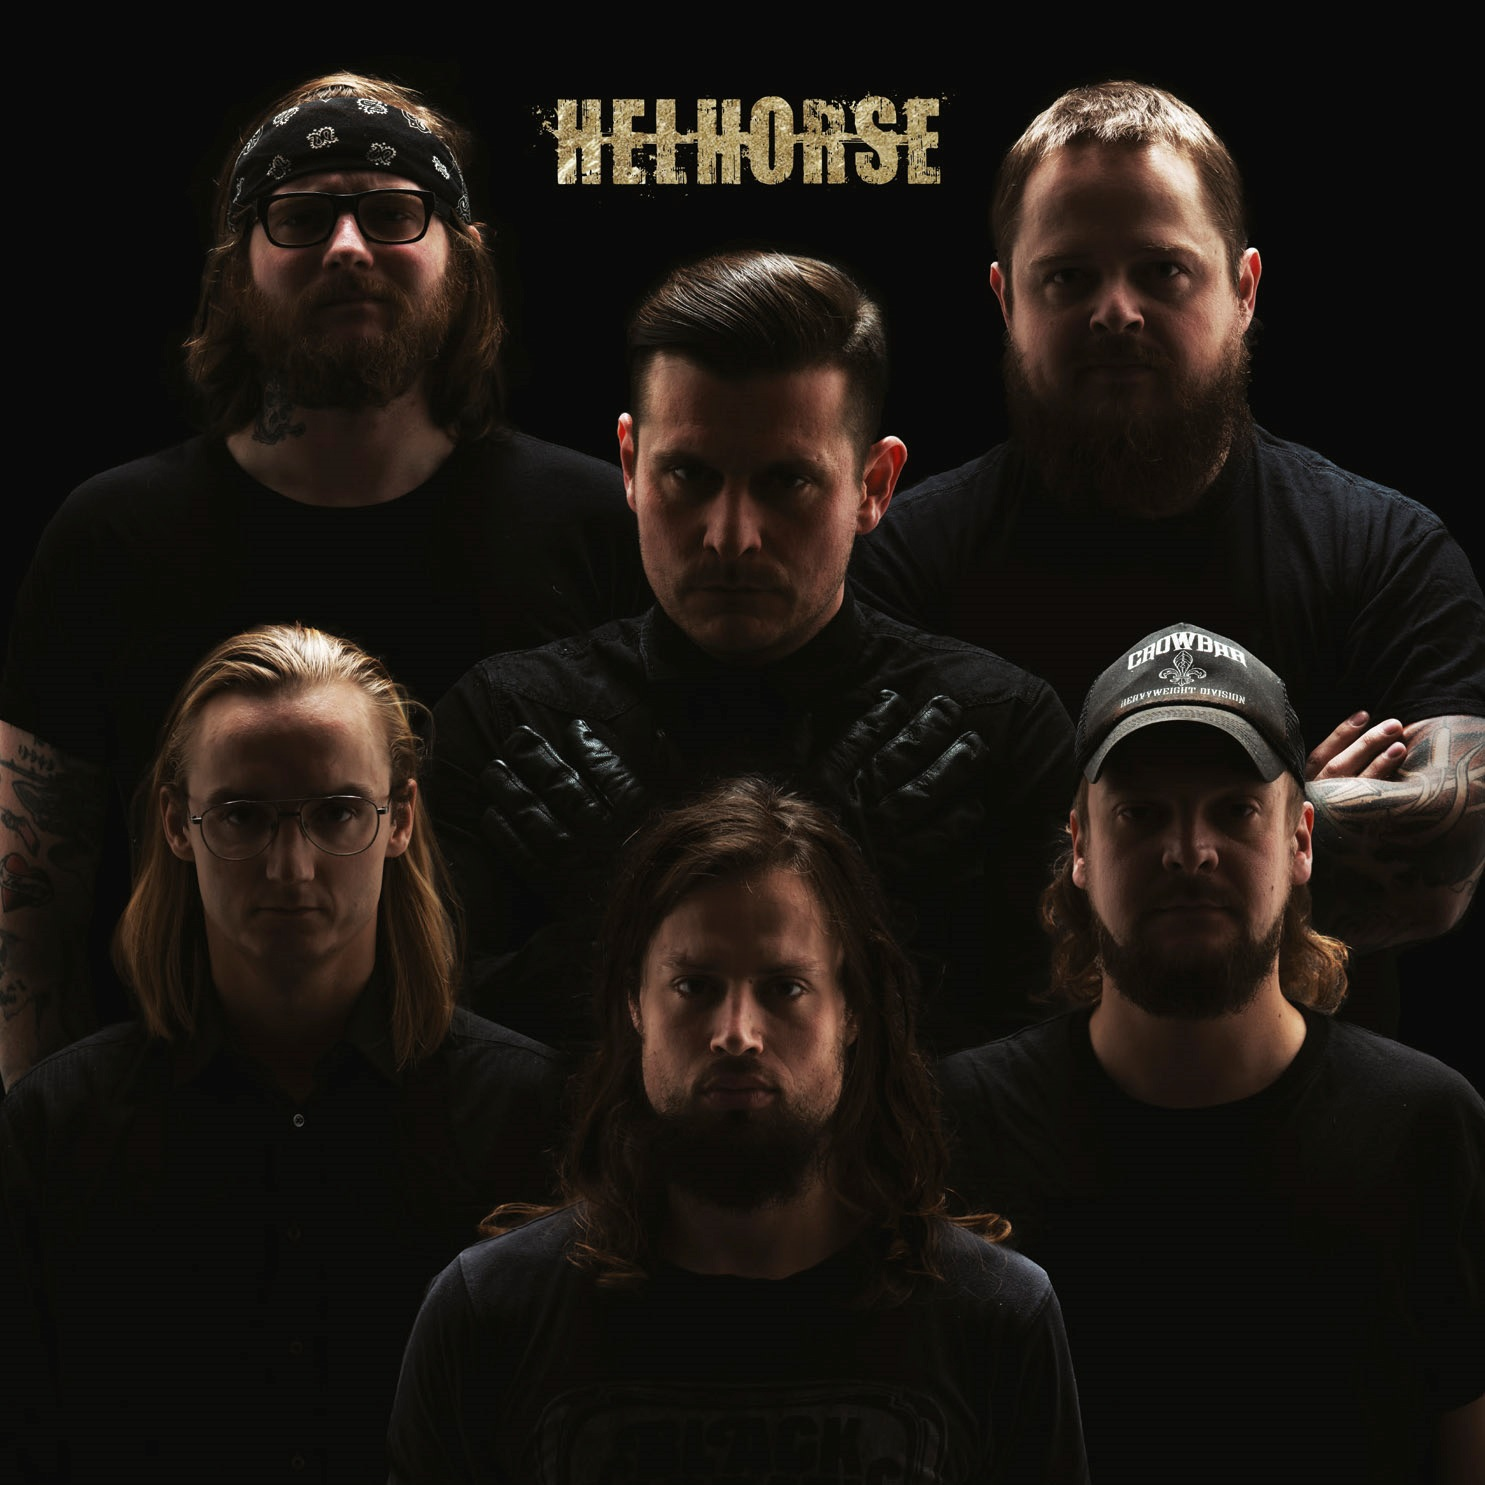 Helhorse Cover